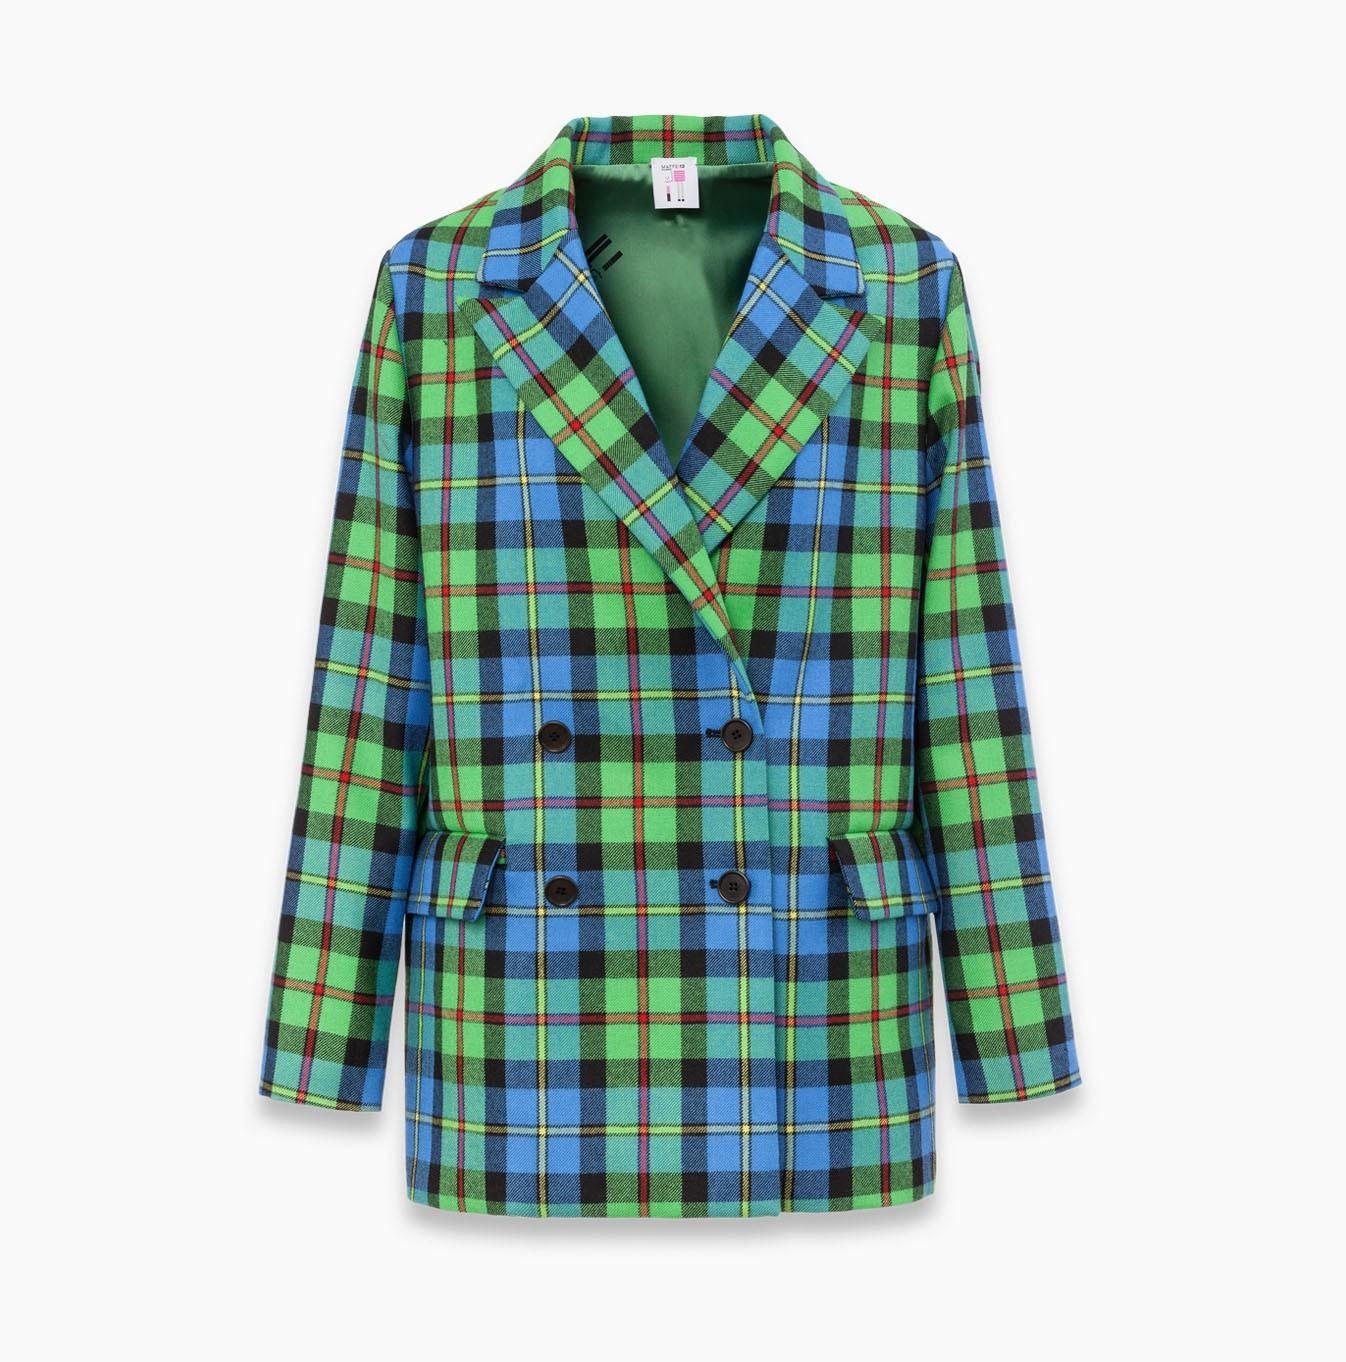 giacca donna tartan | Maffei12 Milano